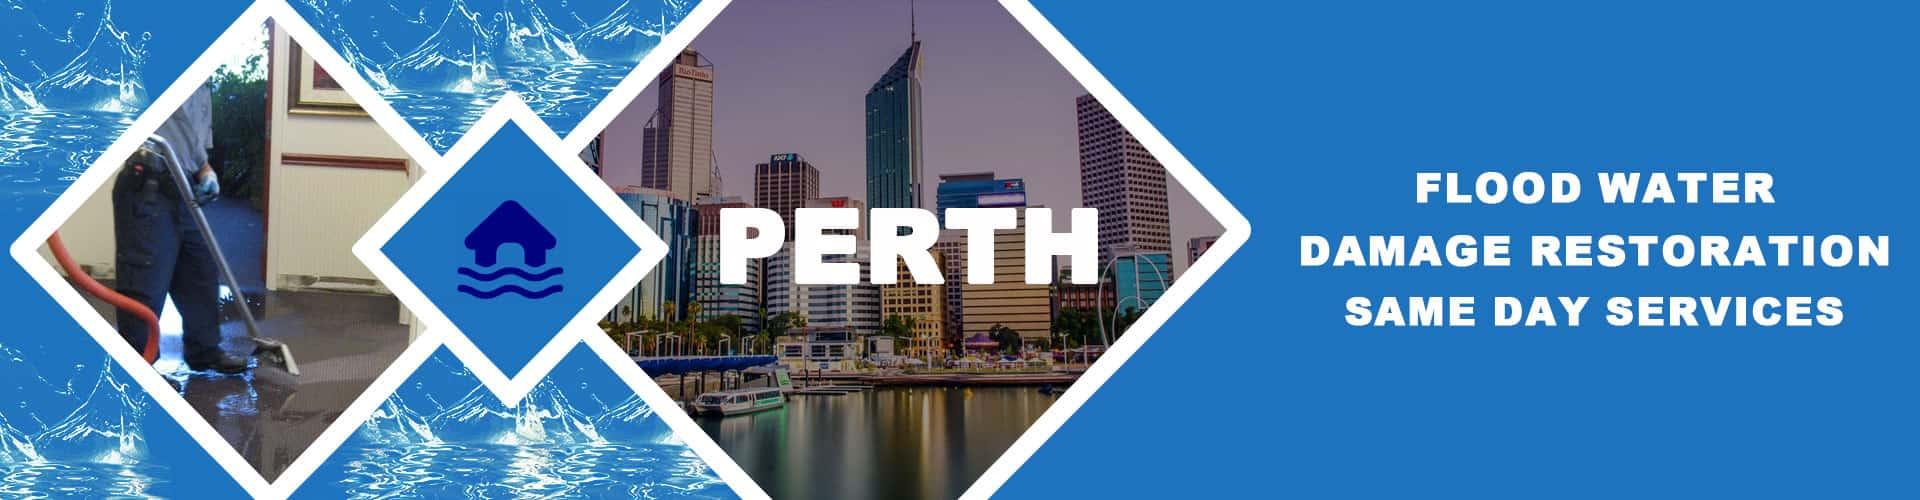 Carpet Flood Water Damage Restoration Perth